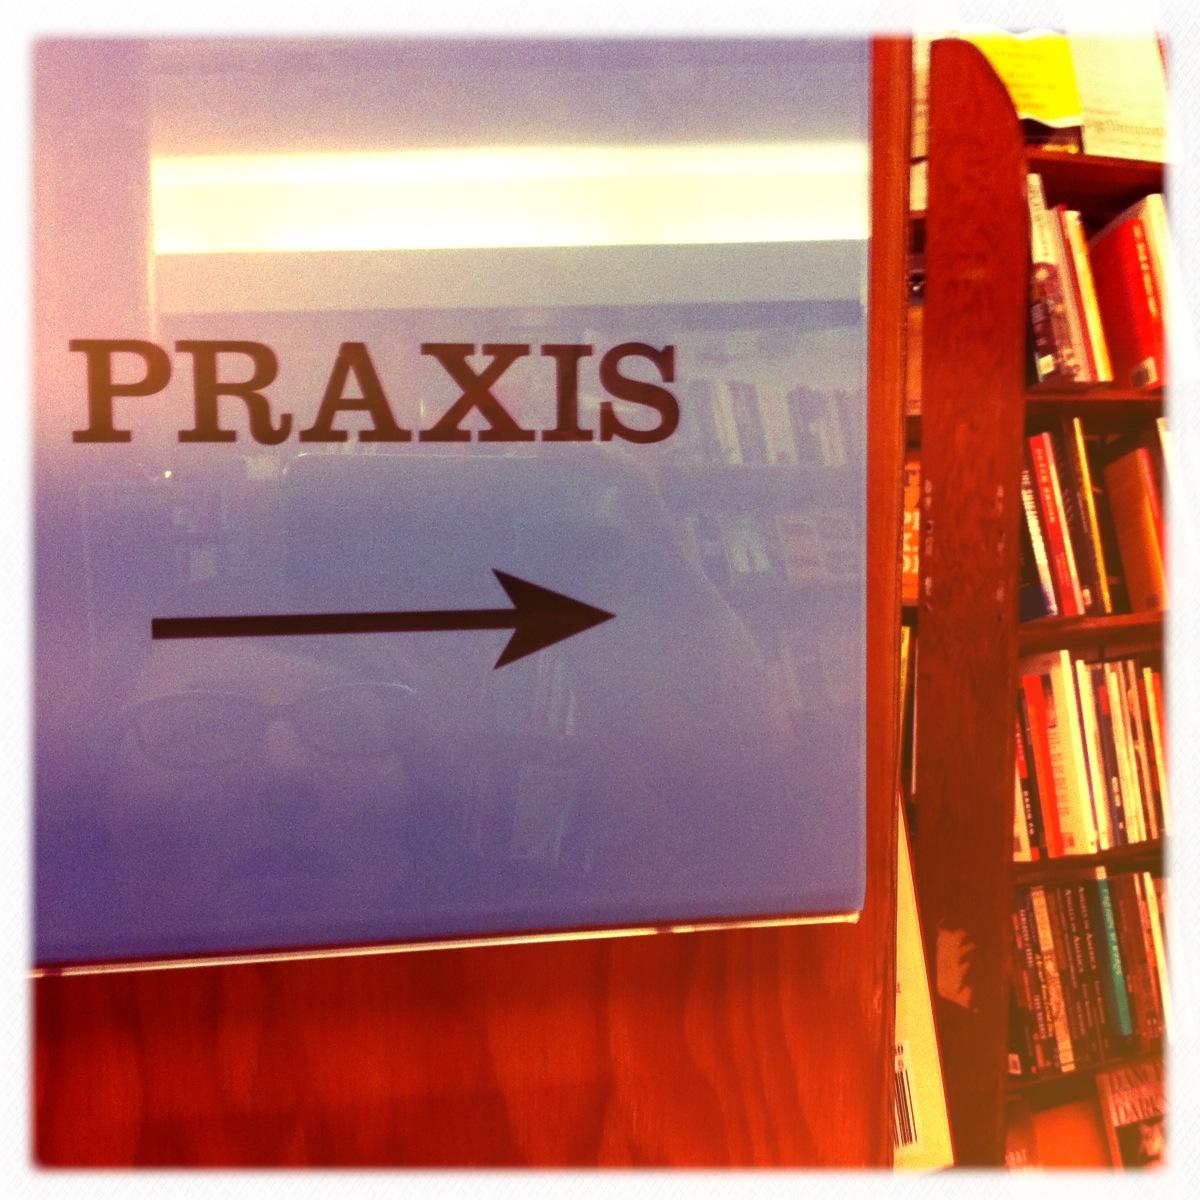 Cool Praxis Shower Stalls Photos - Luxurious Bathtub Ideas and ...